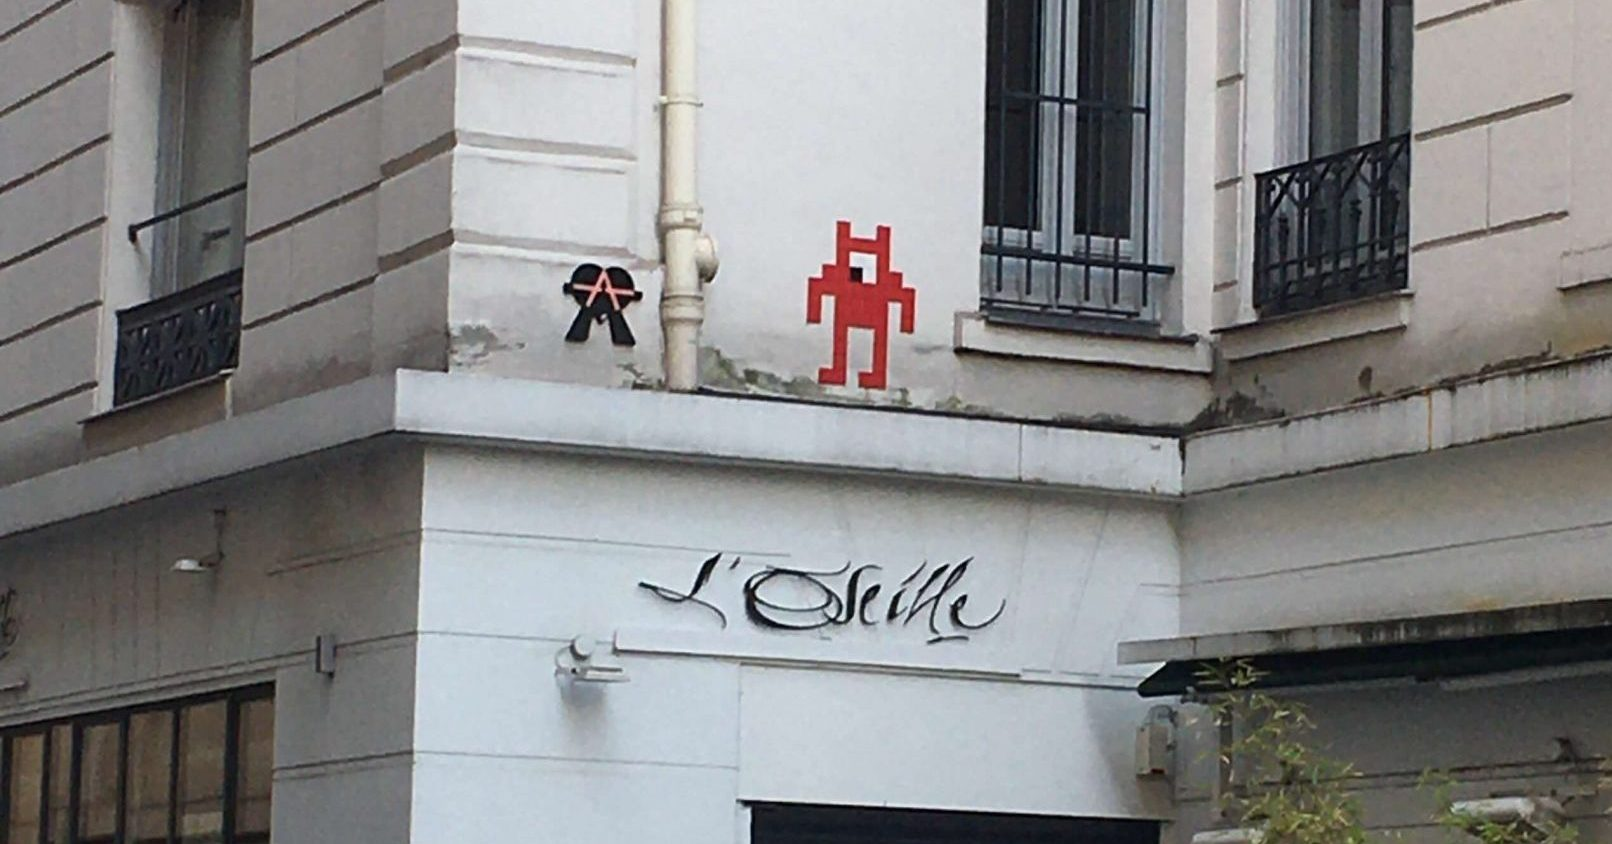 space invader street art in Paris